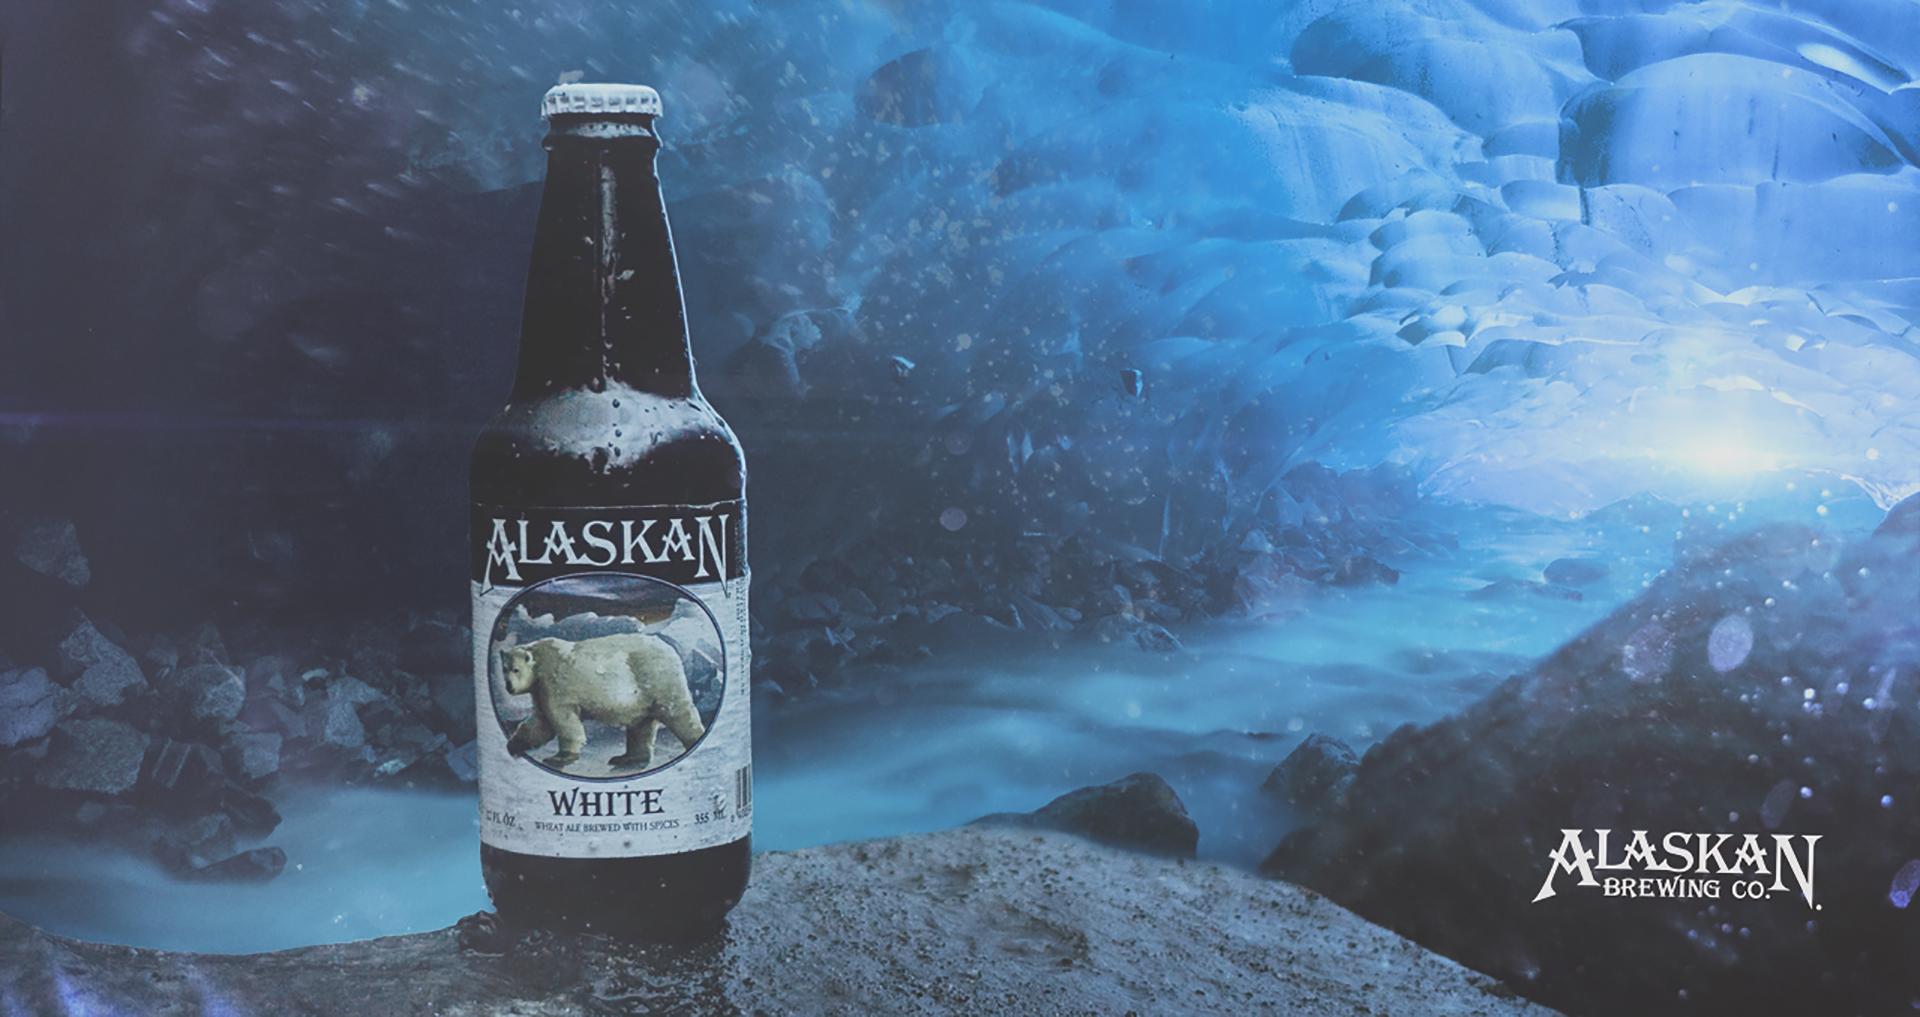 Redtail-AlaskanBC-Ads-005.jpg